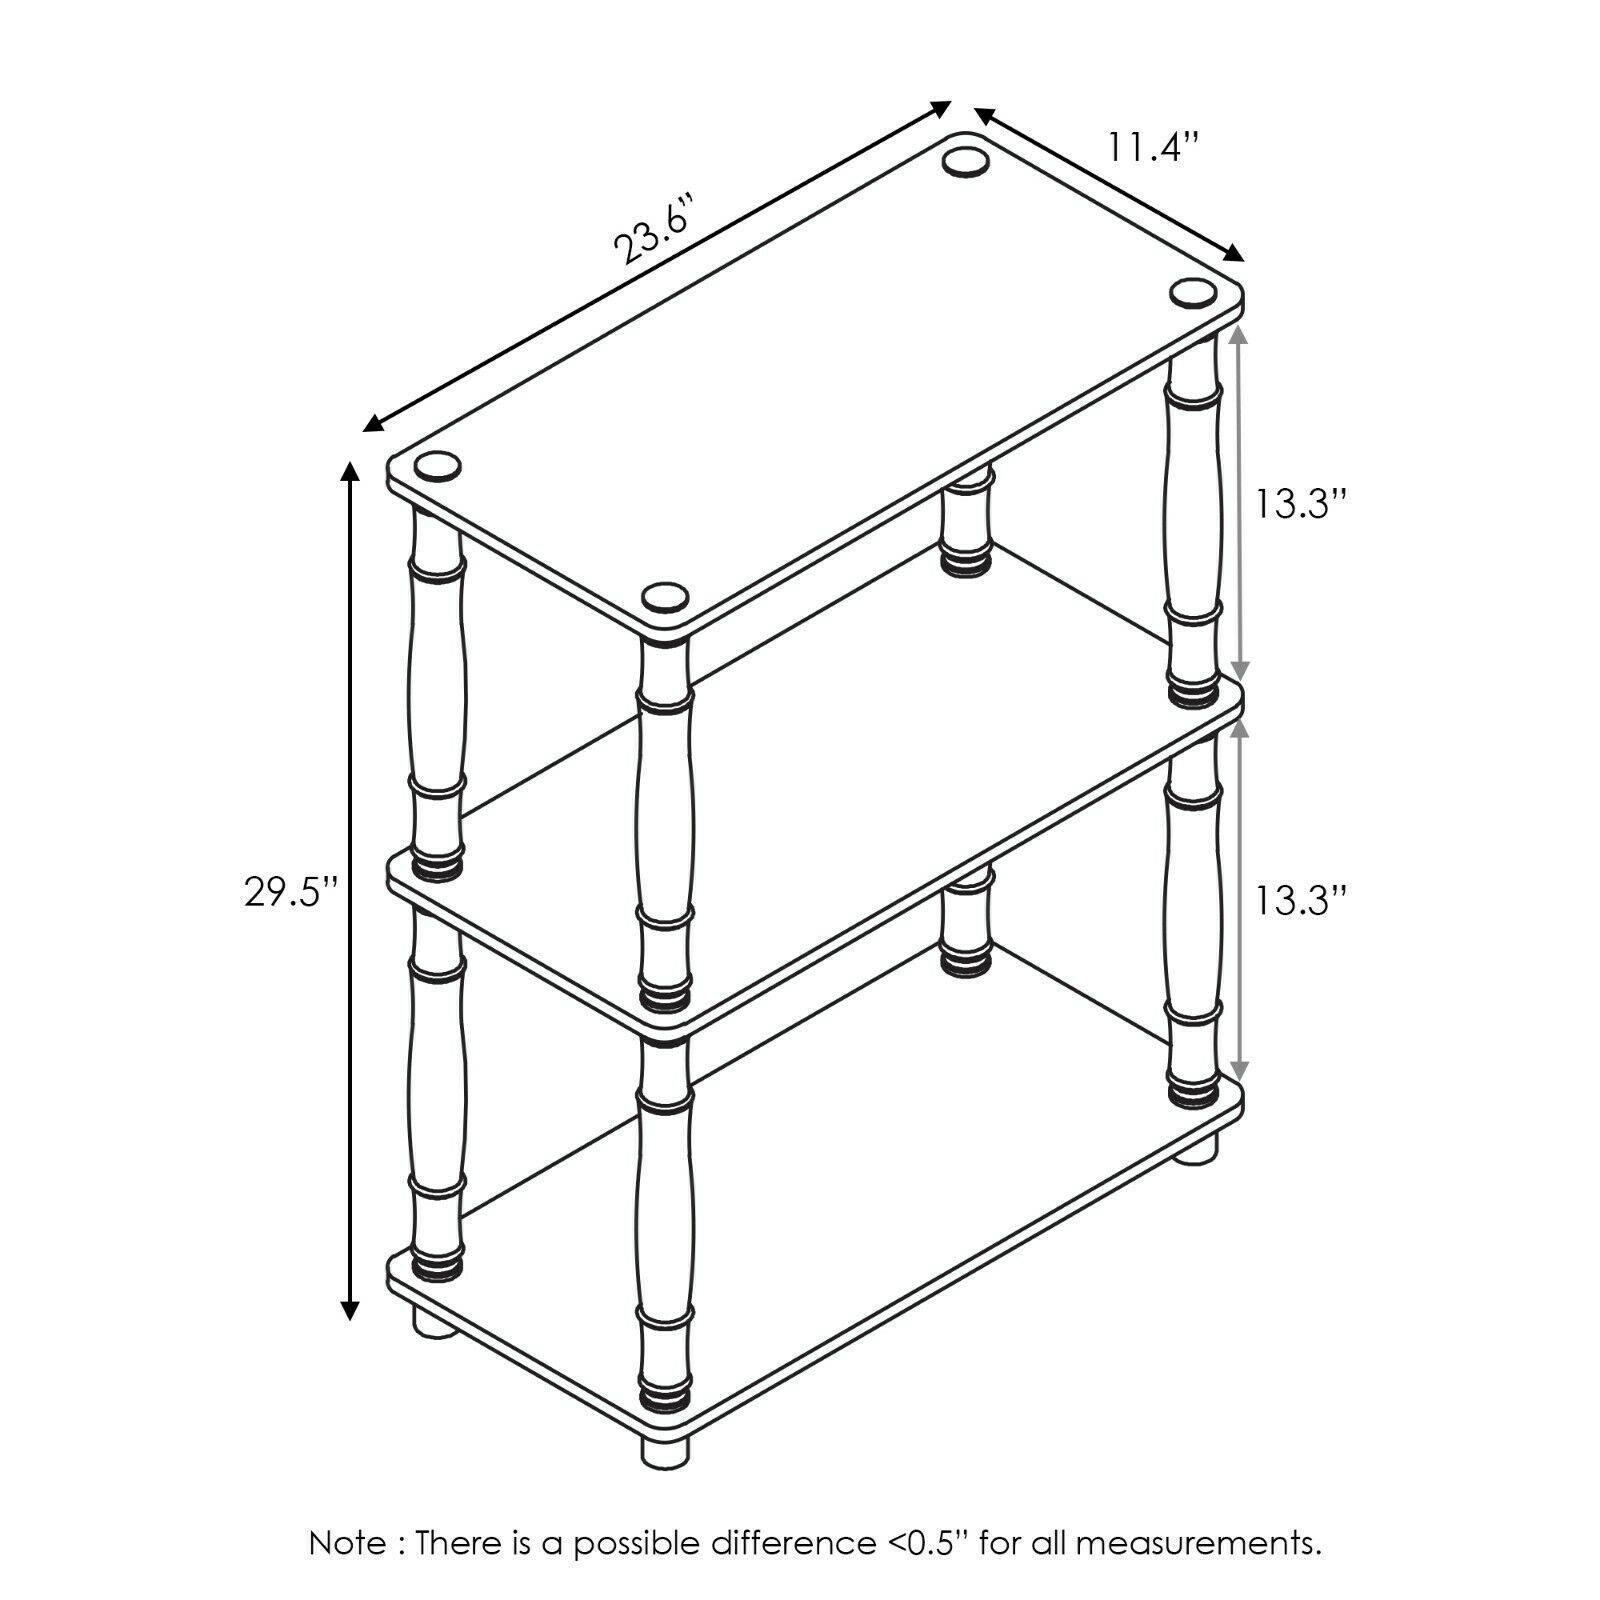 Furinno Turn-N-Tube 3-Tier Compact Multipurpose Shelf Display Rack Classic Tube